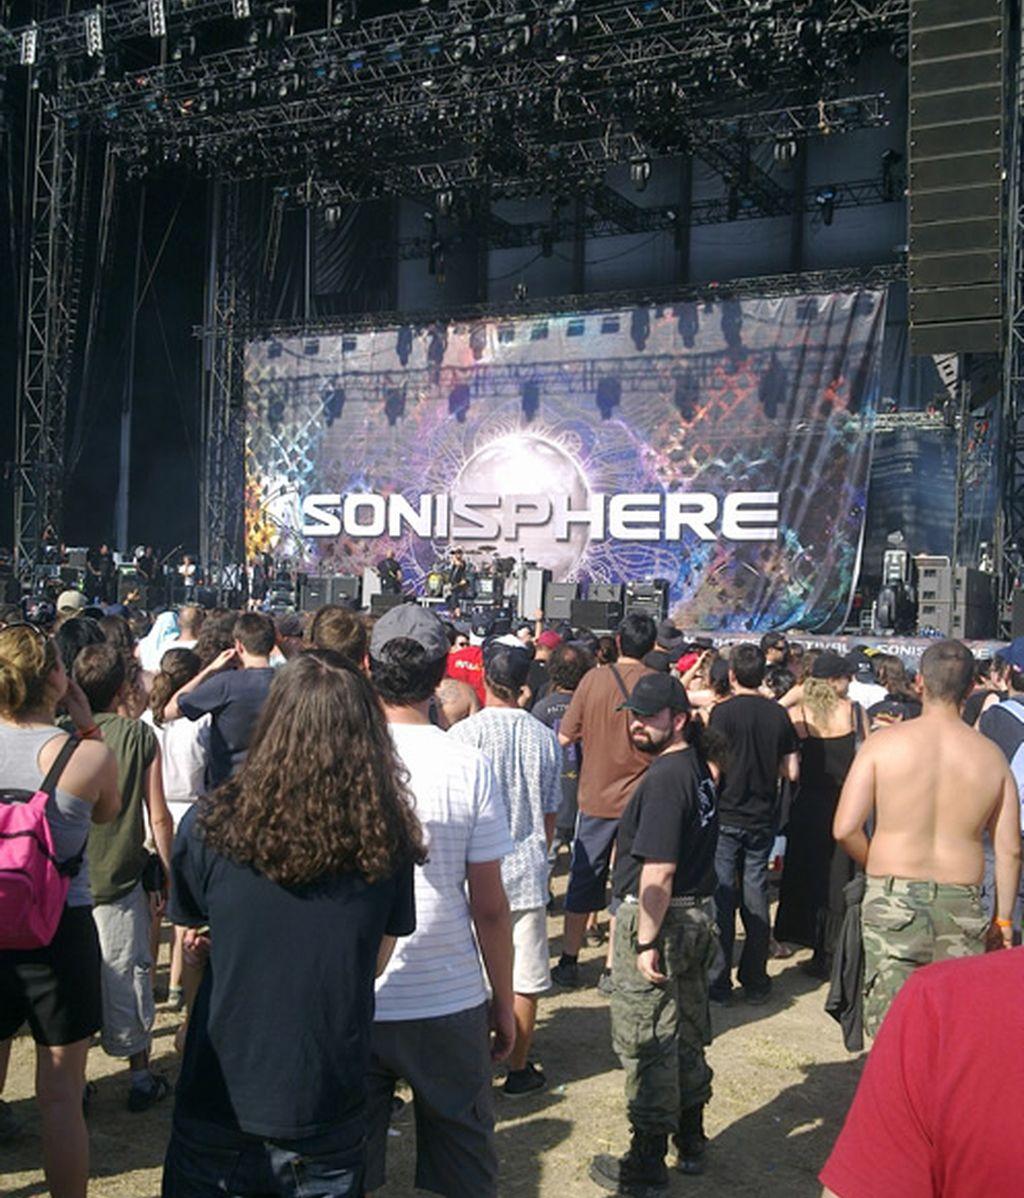 Sonisphere Festival